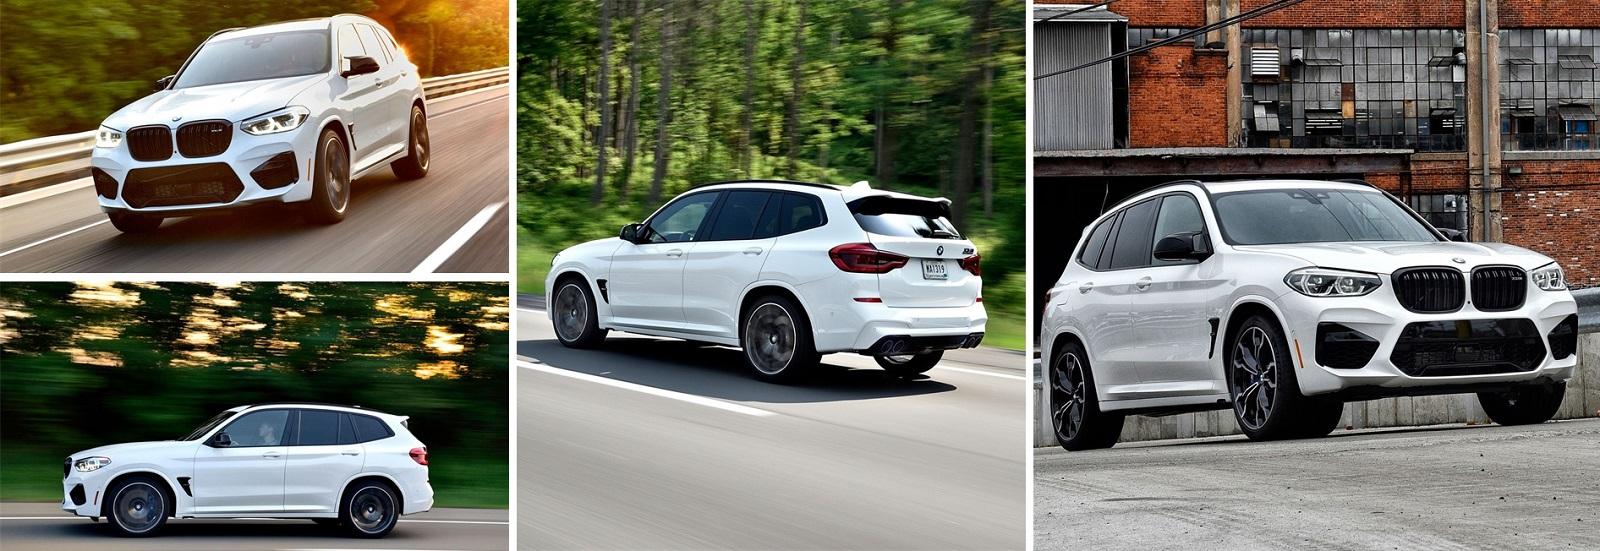 2020 BMW X3 M Exterior Design